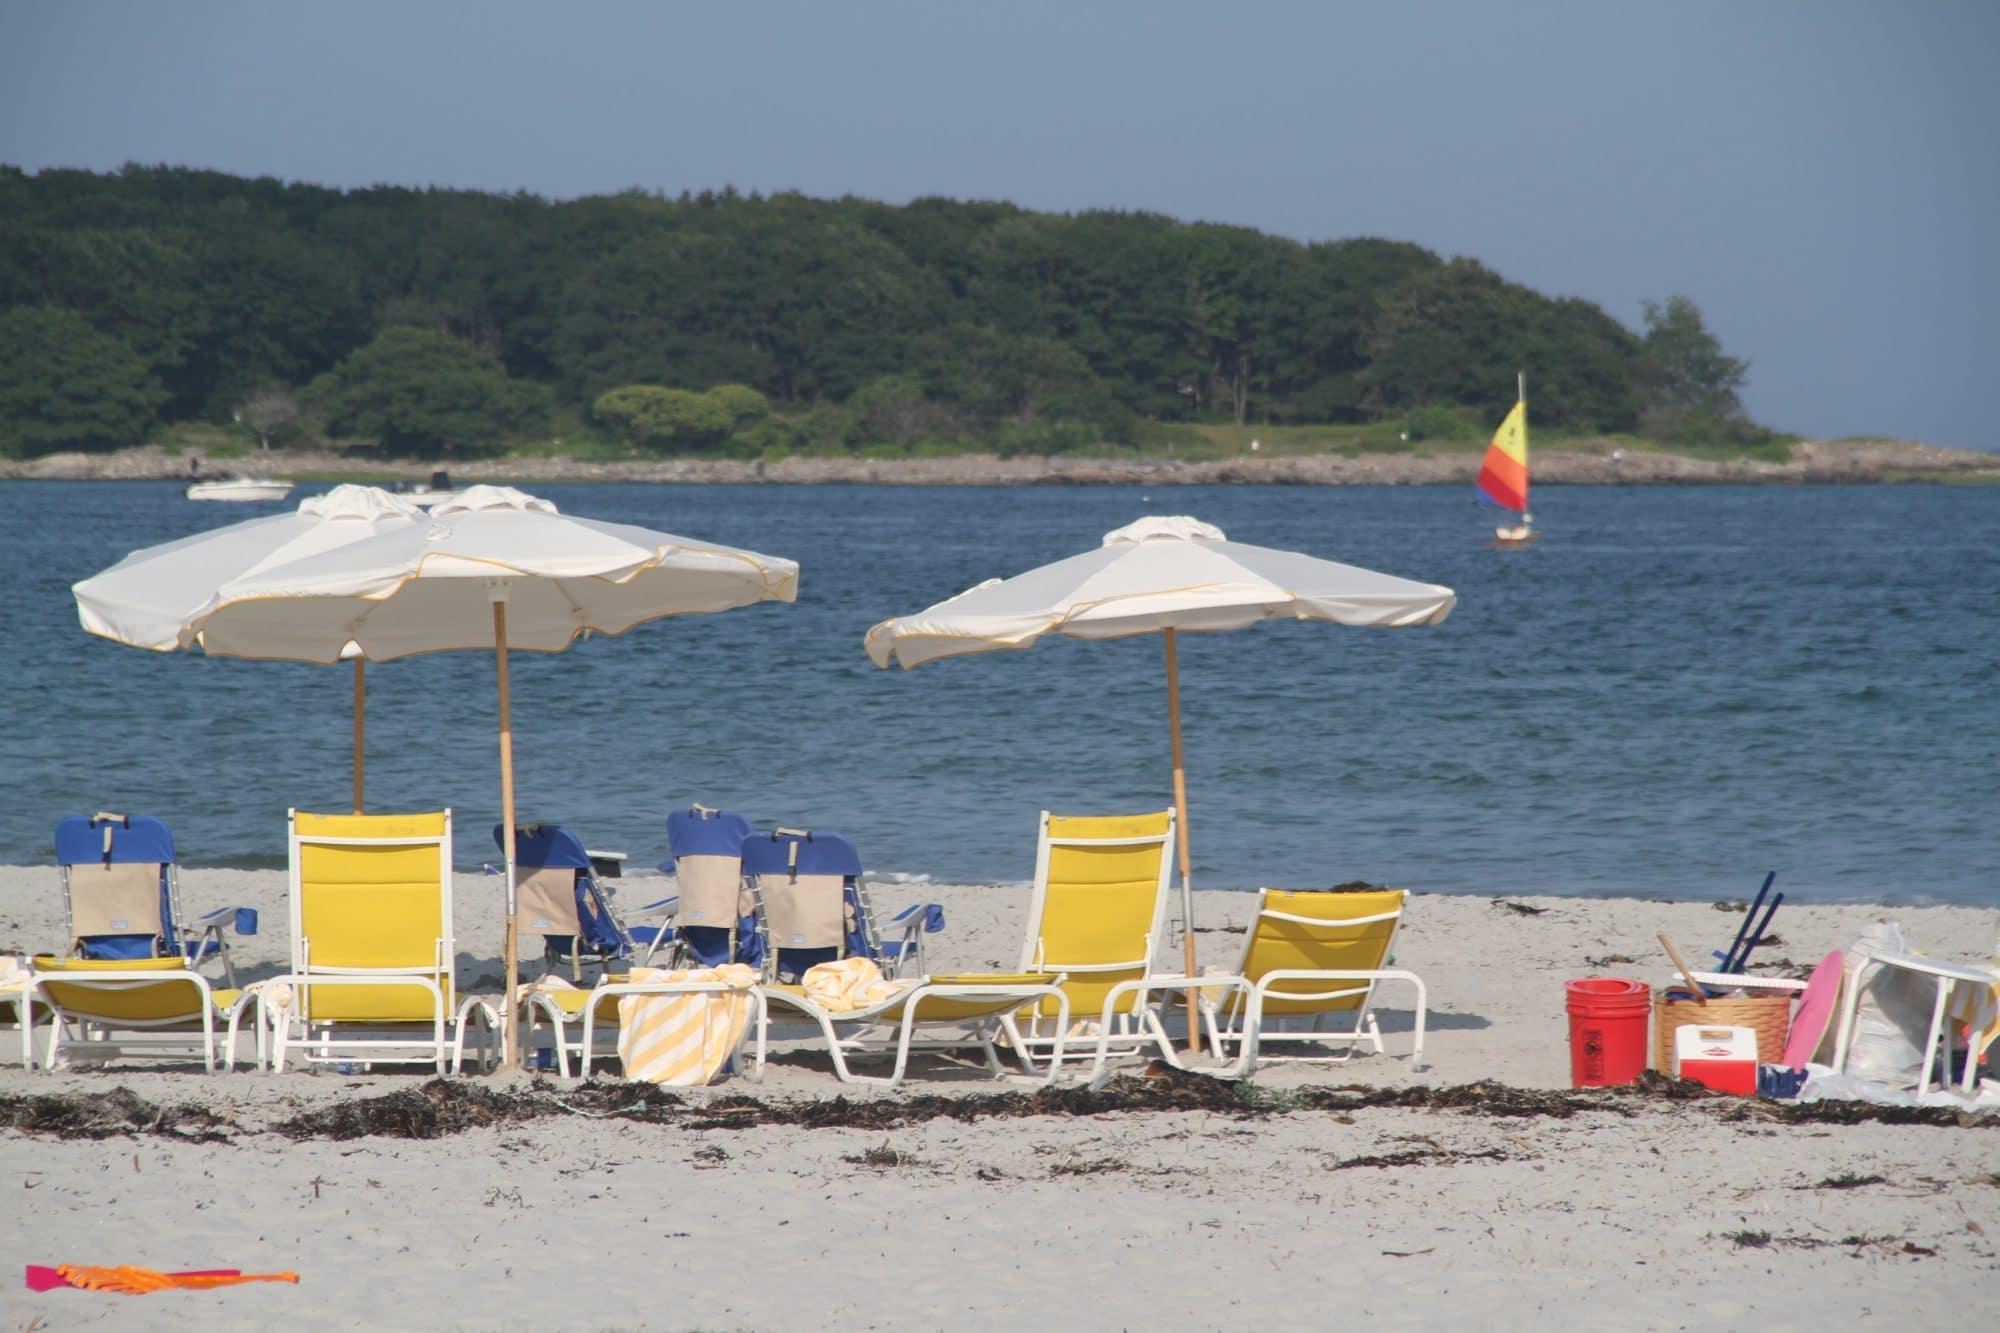 goose-rocks-beach-umbrellas-sailboat2